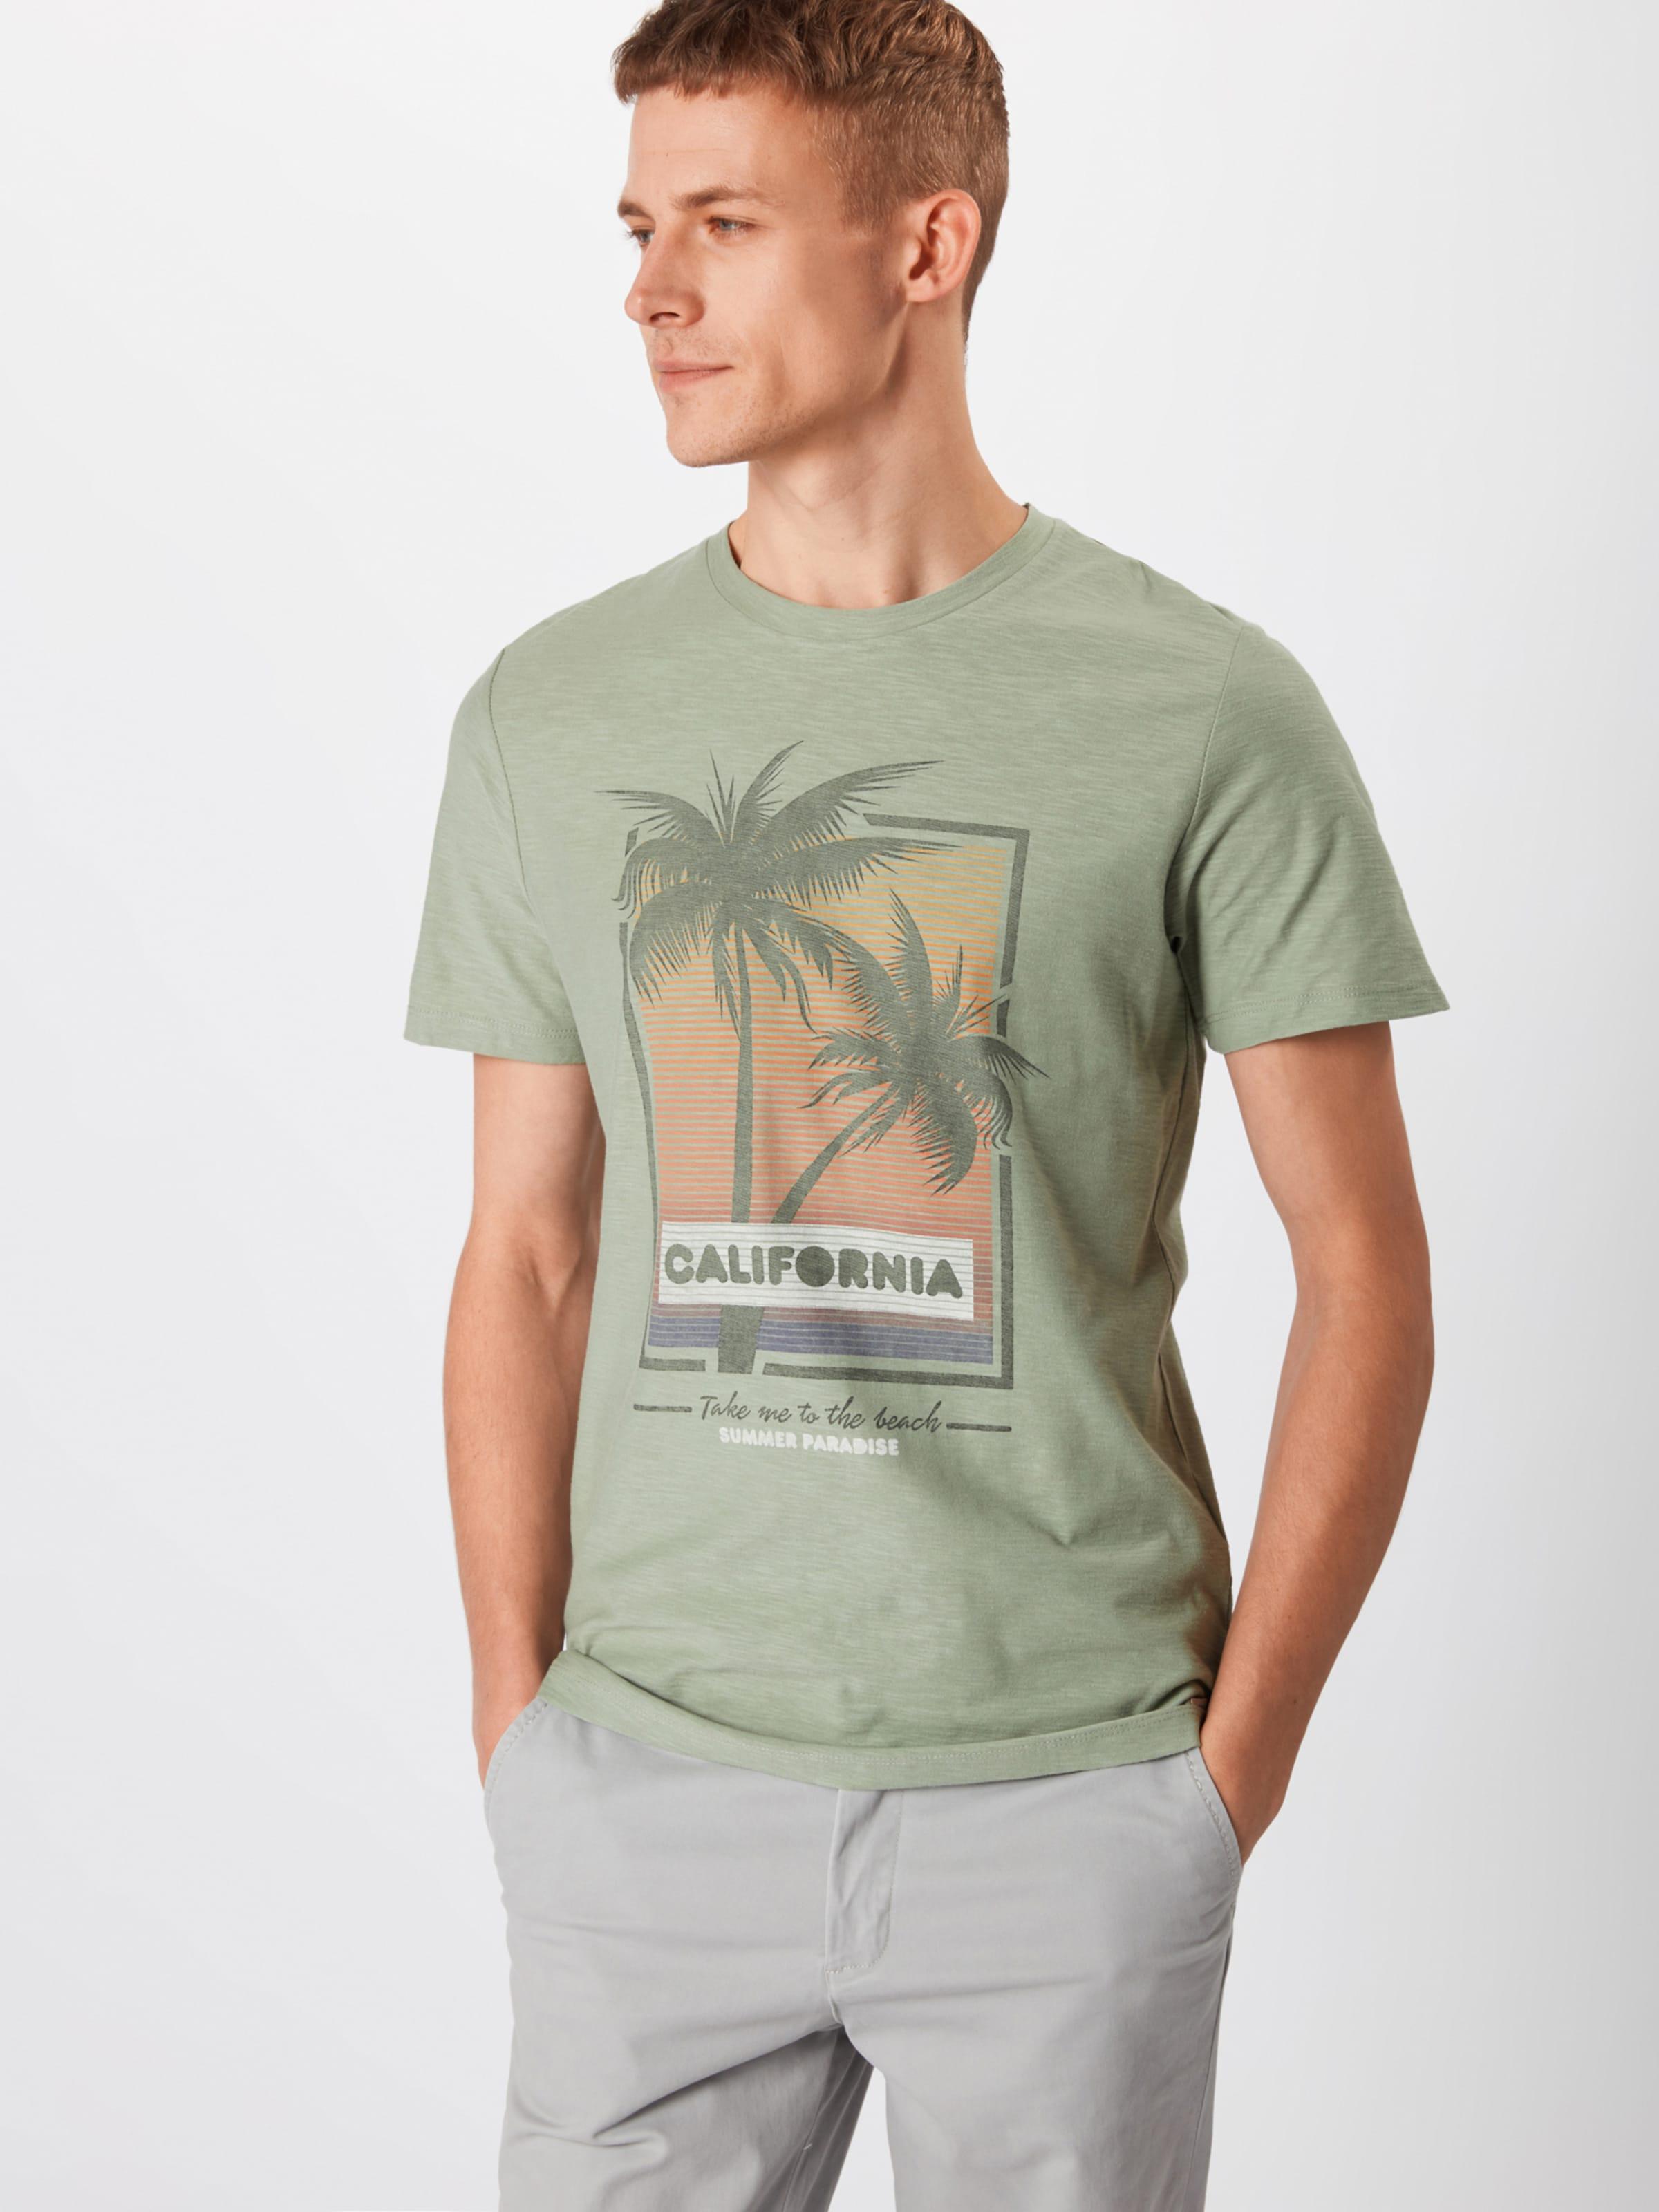 Jones De 'newpleo' Jackamp; Bleu Couleurs ClairMélange En T shirt 8PkOXwn0